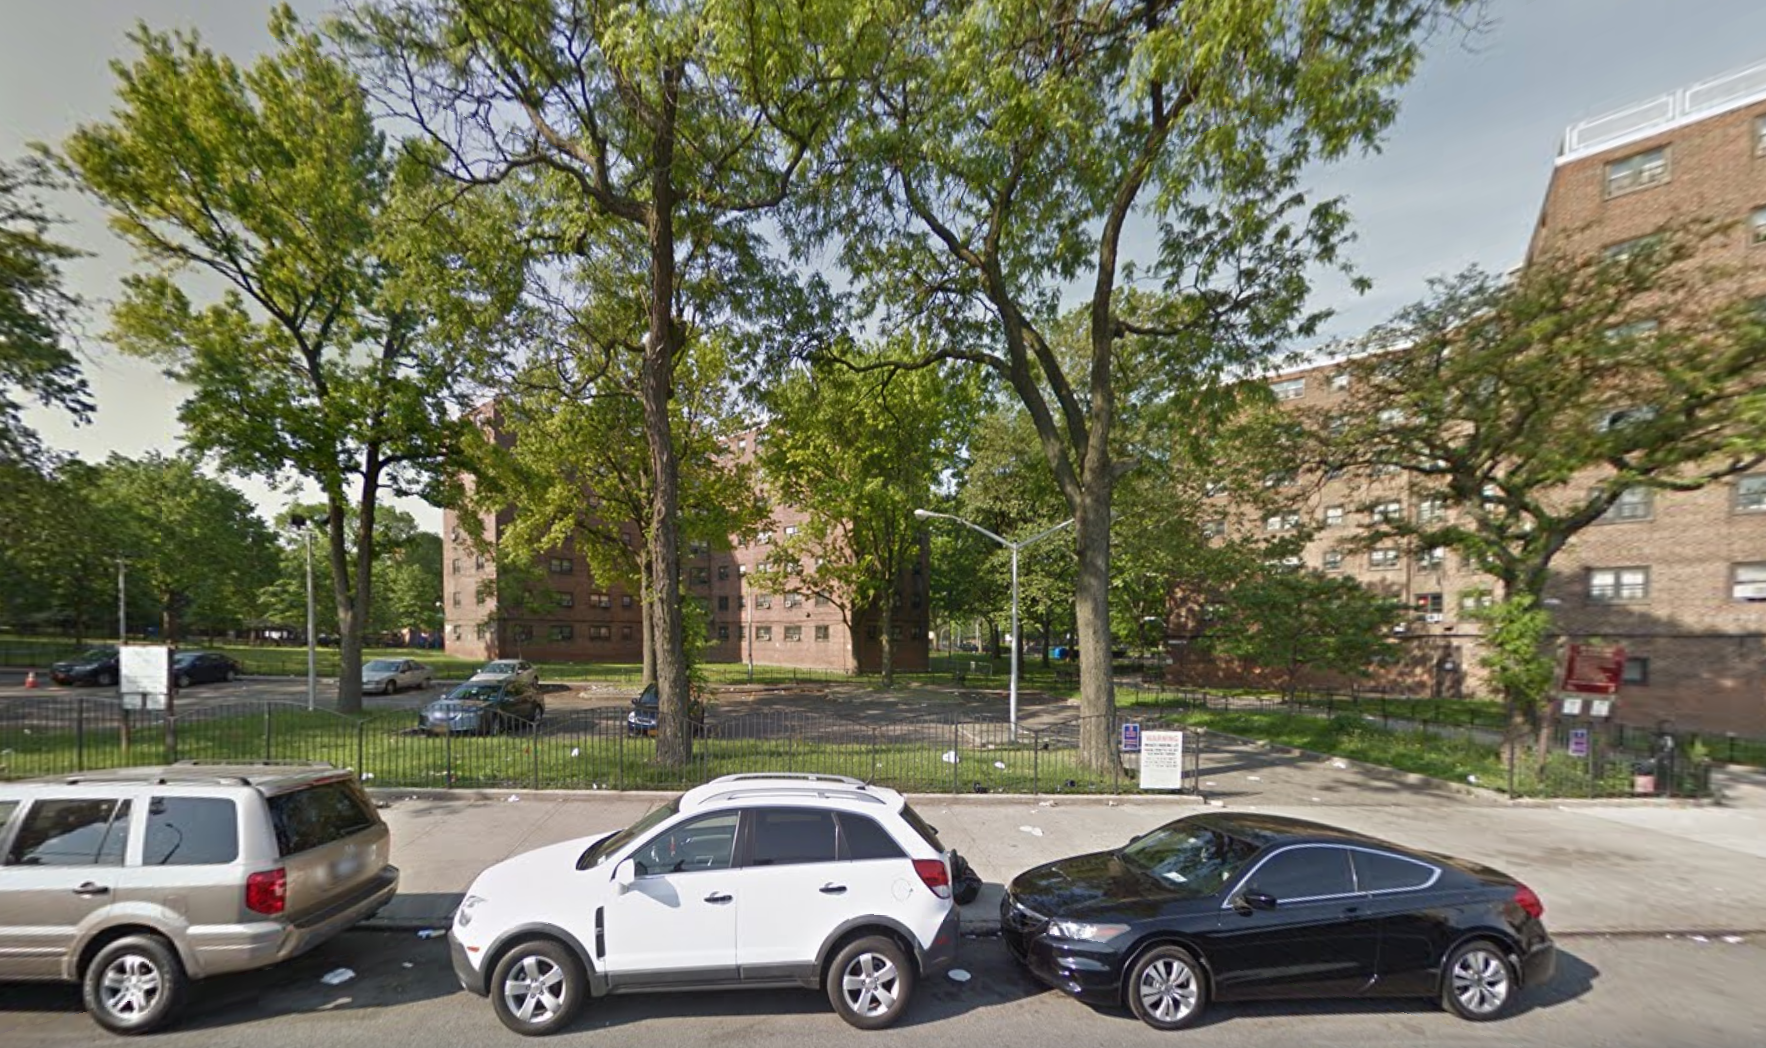 3-24 27th Avenue, image via Google Maps